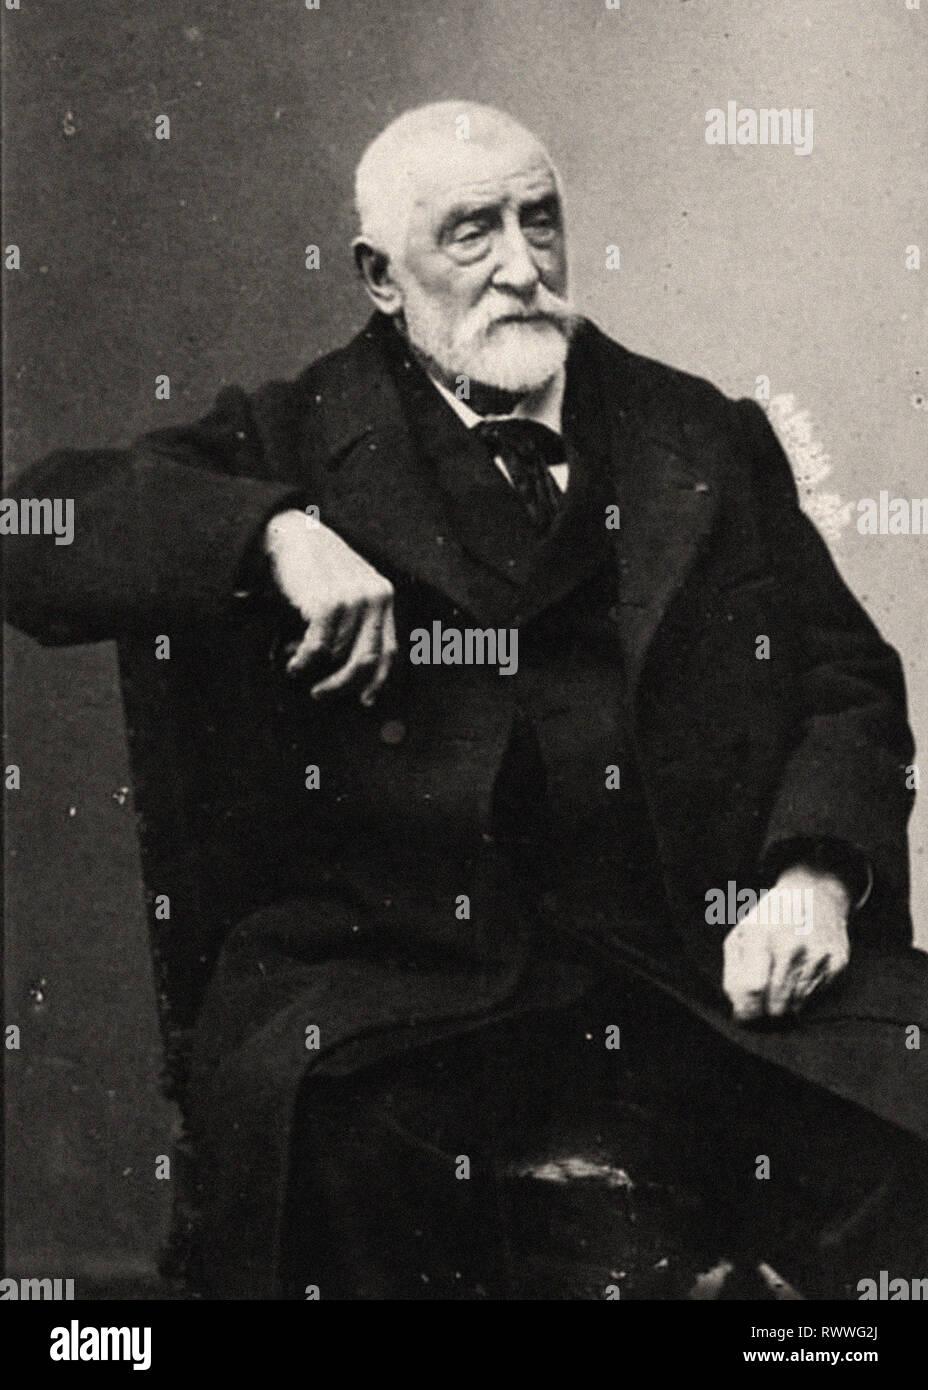 Photographic portrait of Harpignies - Stock Image